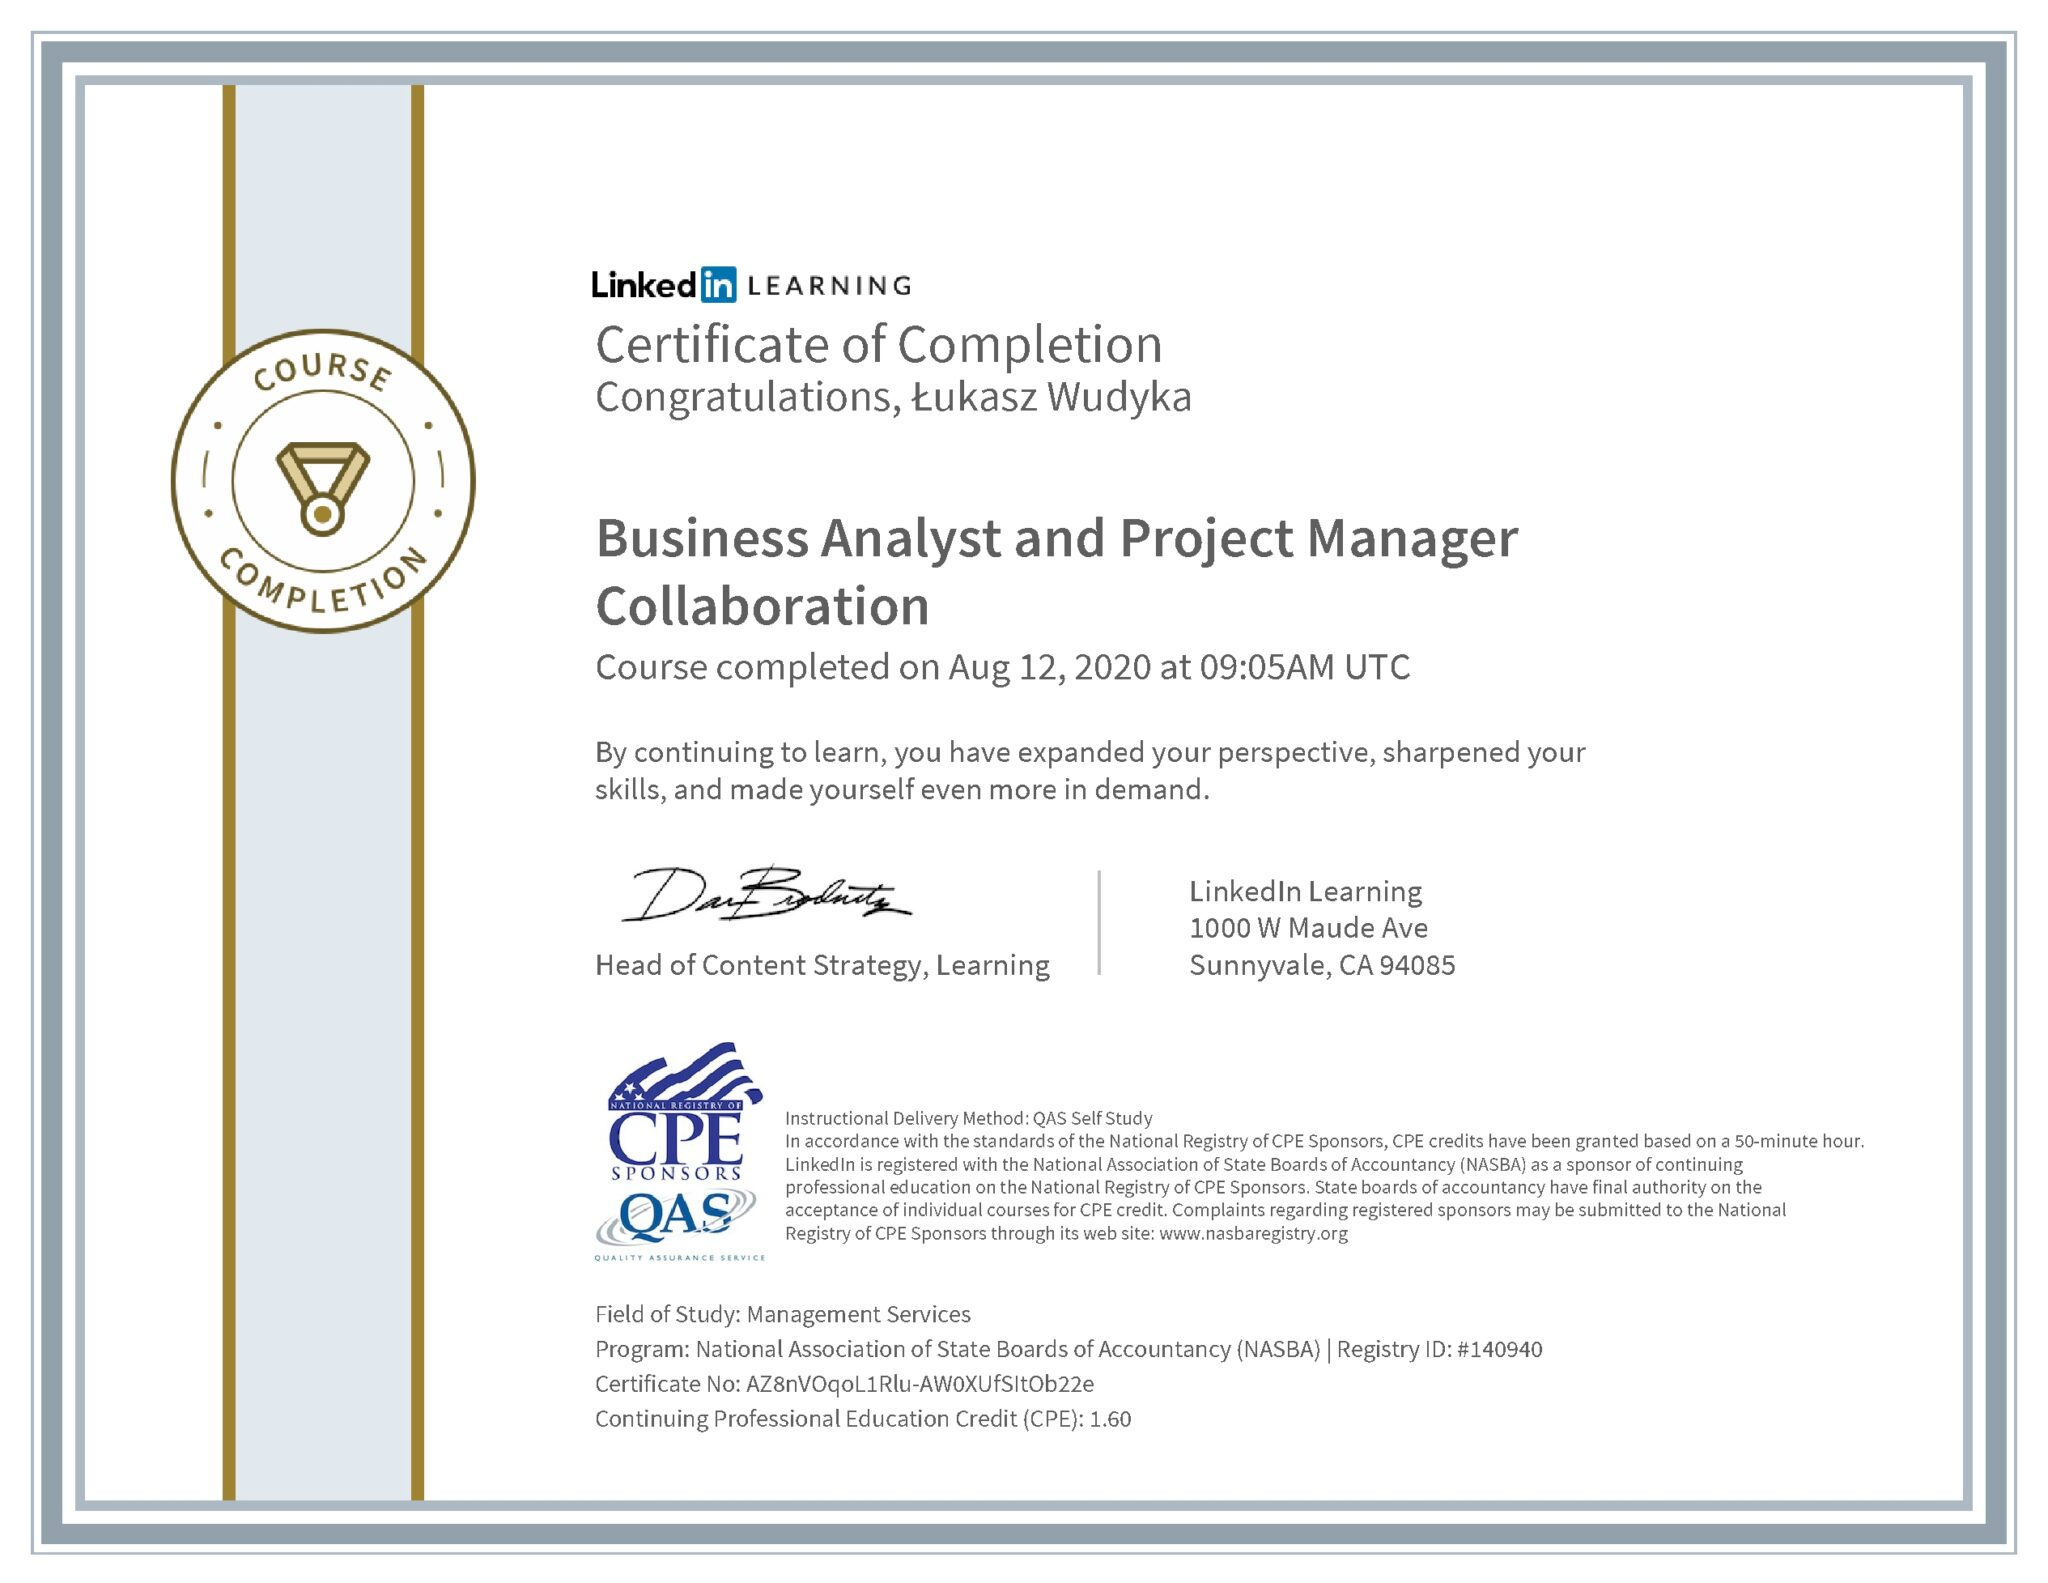 Łukasz Wudyka certyfikat LinkedIn Business Analysis and Project Manager Callaboration NASBA